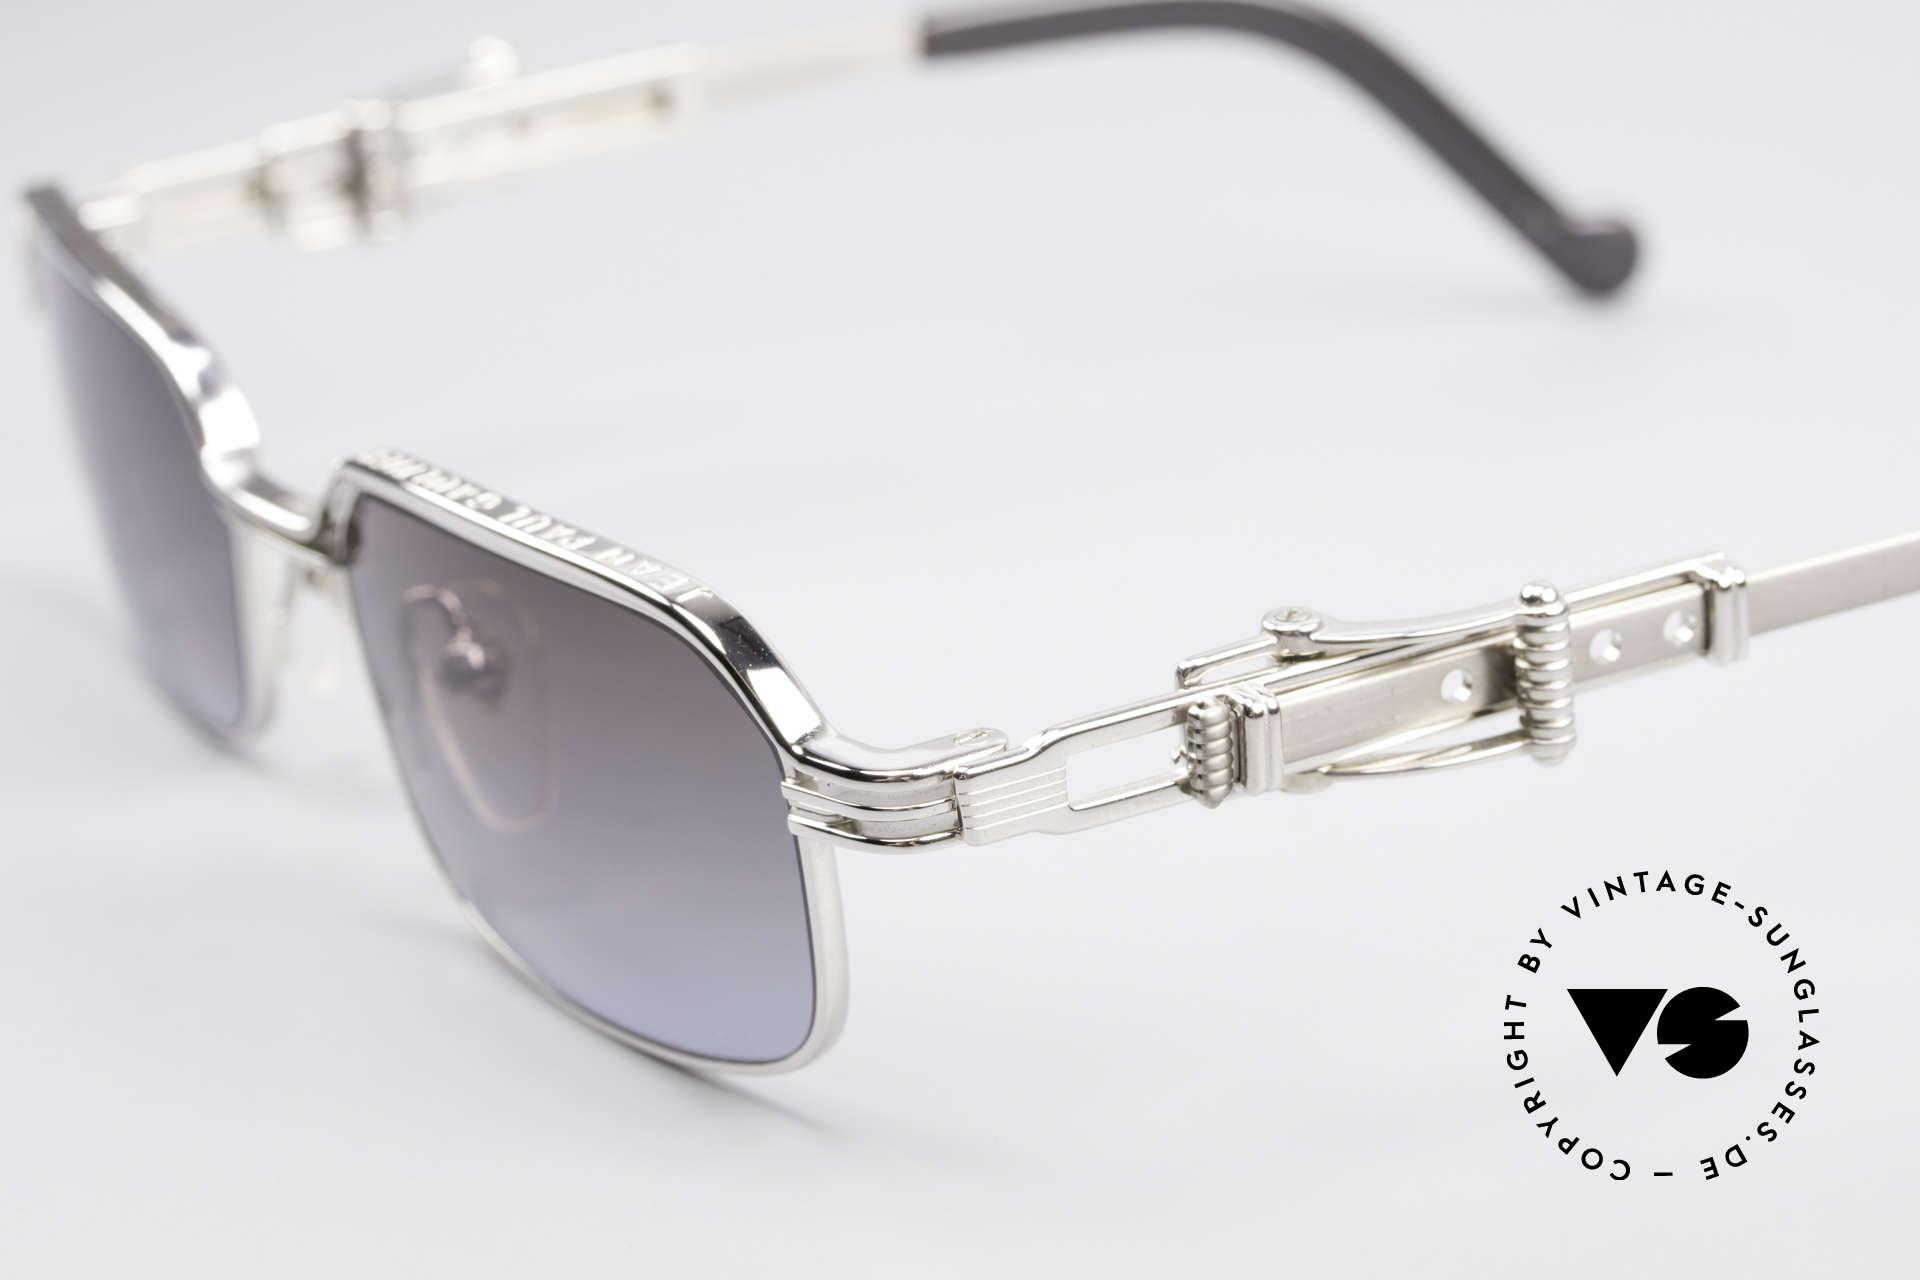 Jean Paul Gaultier 56-0002 Belt Buckle Frame Adjustable, unworn designer piece (precious, rare, treasured), Made for Men